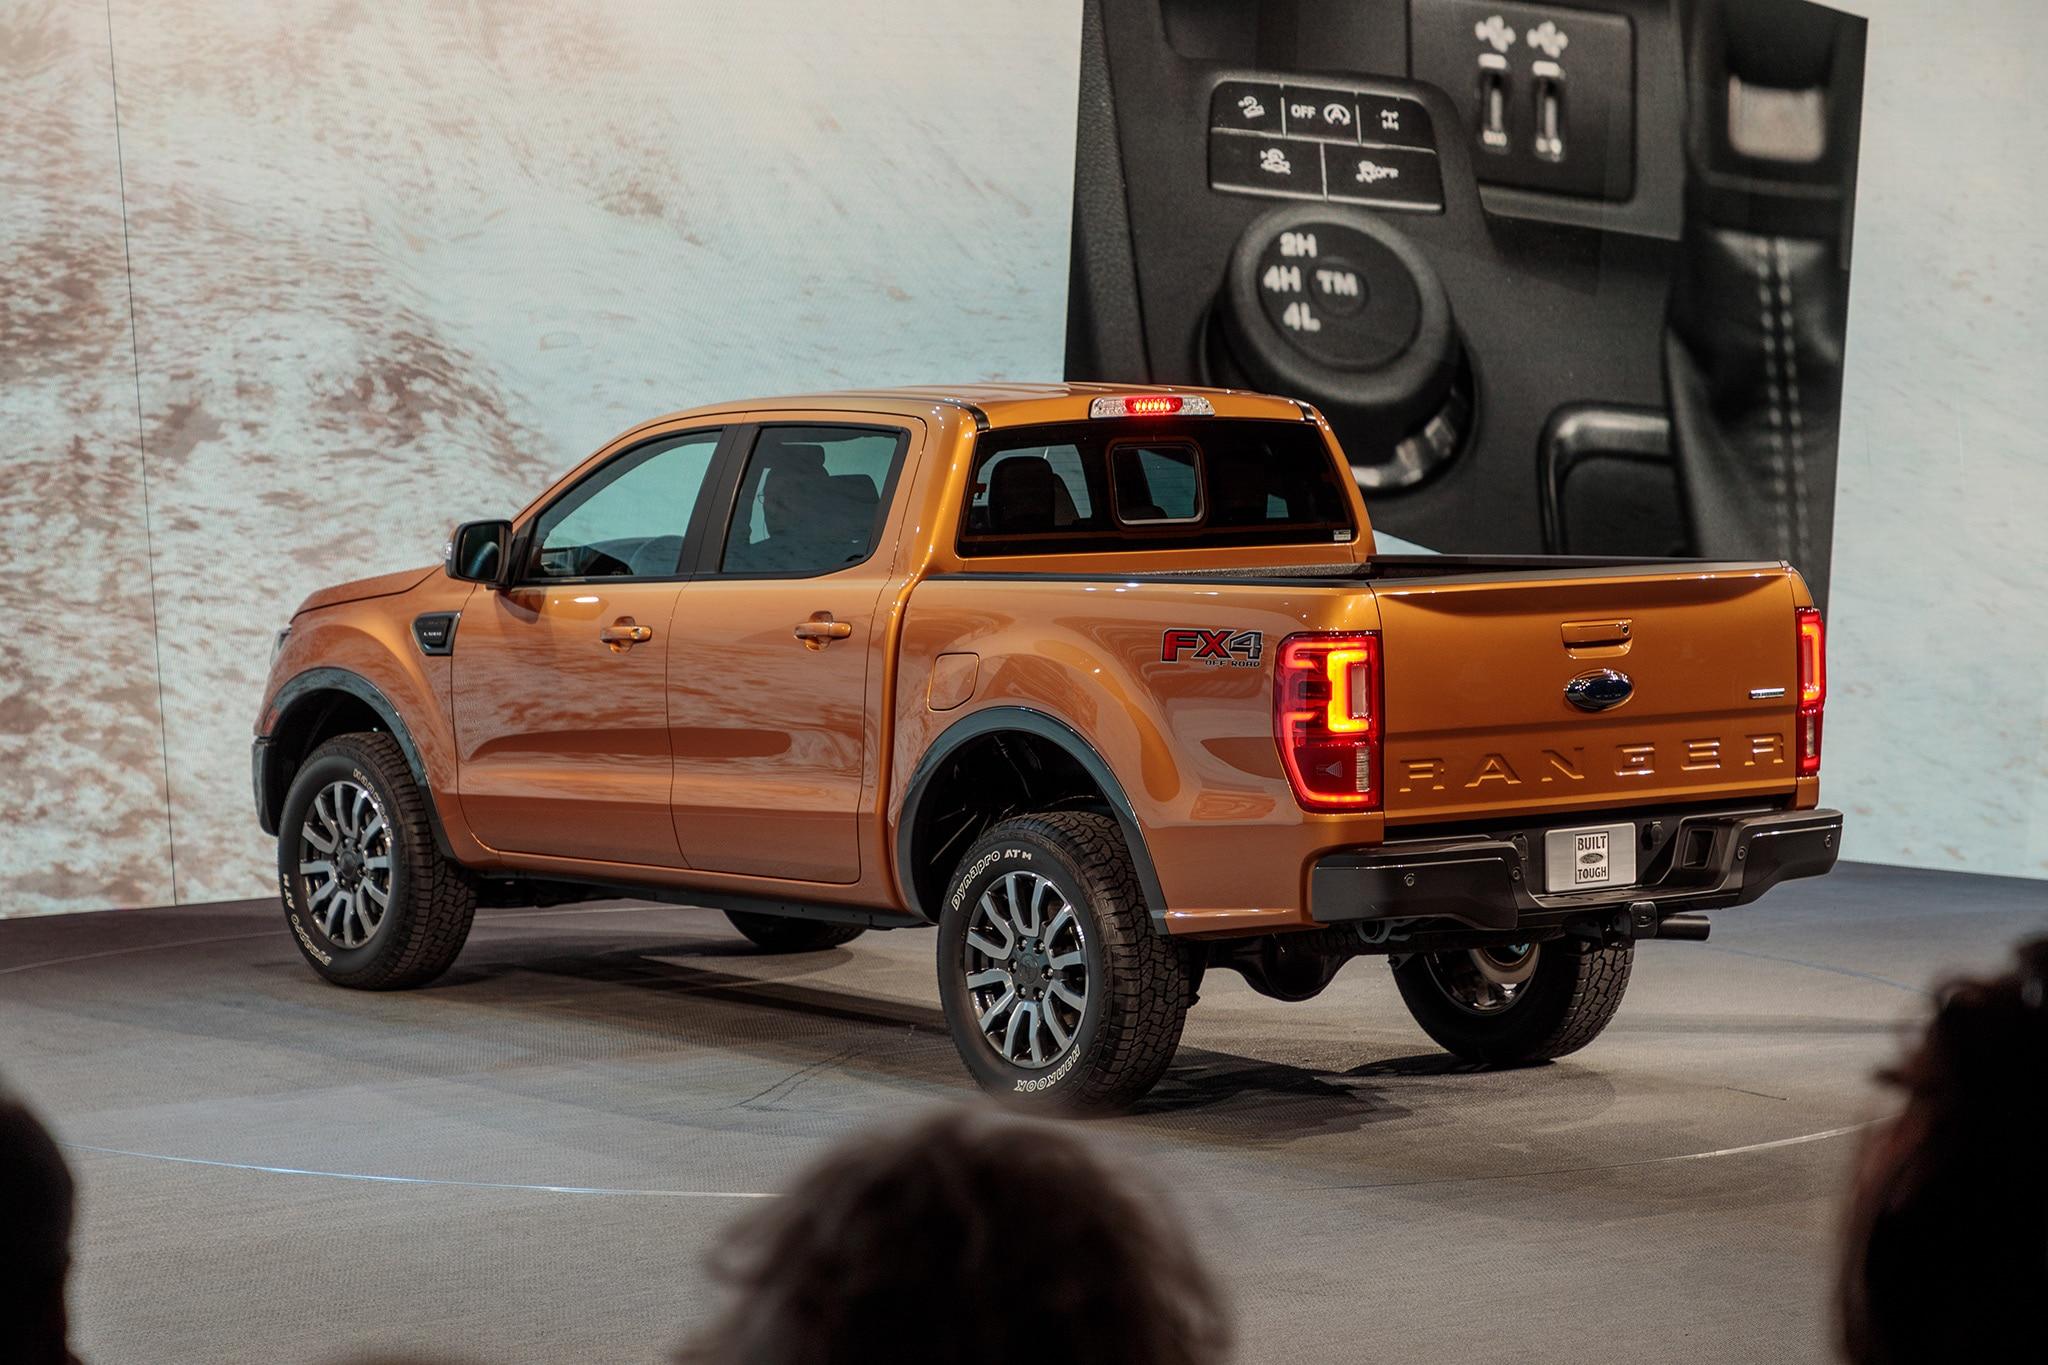 2019 Ford Ranger Lariat Fx4 19 Motor Trend En Espa 241 Ol